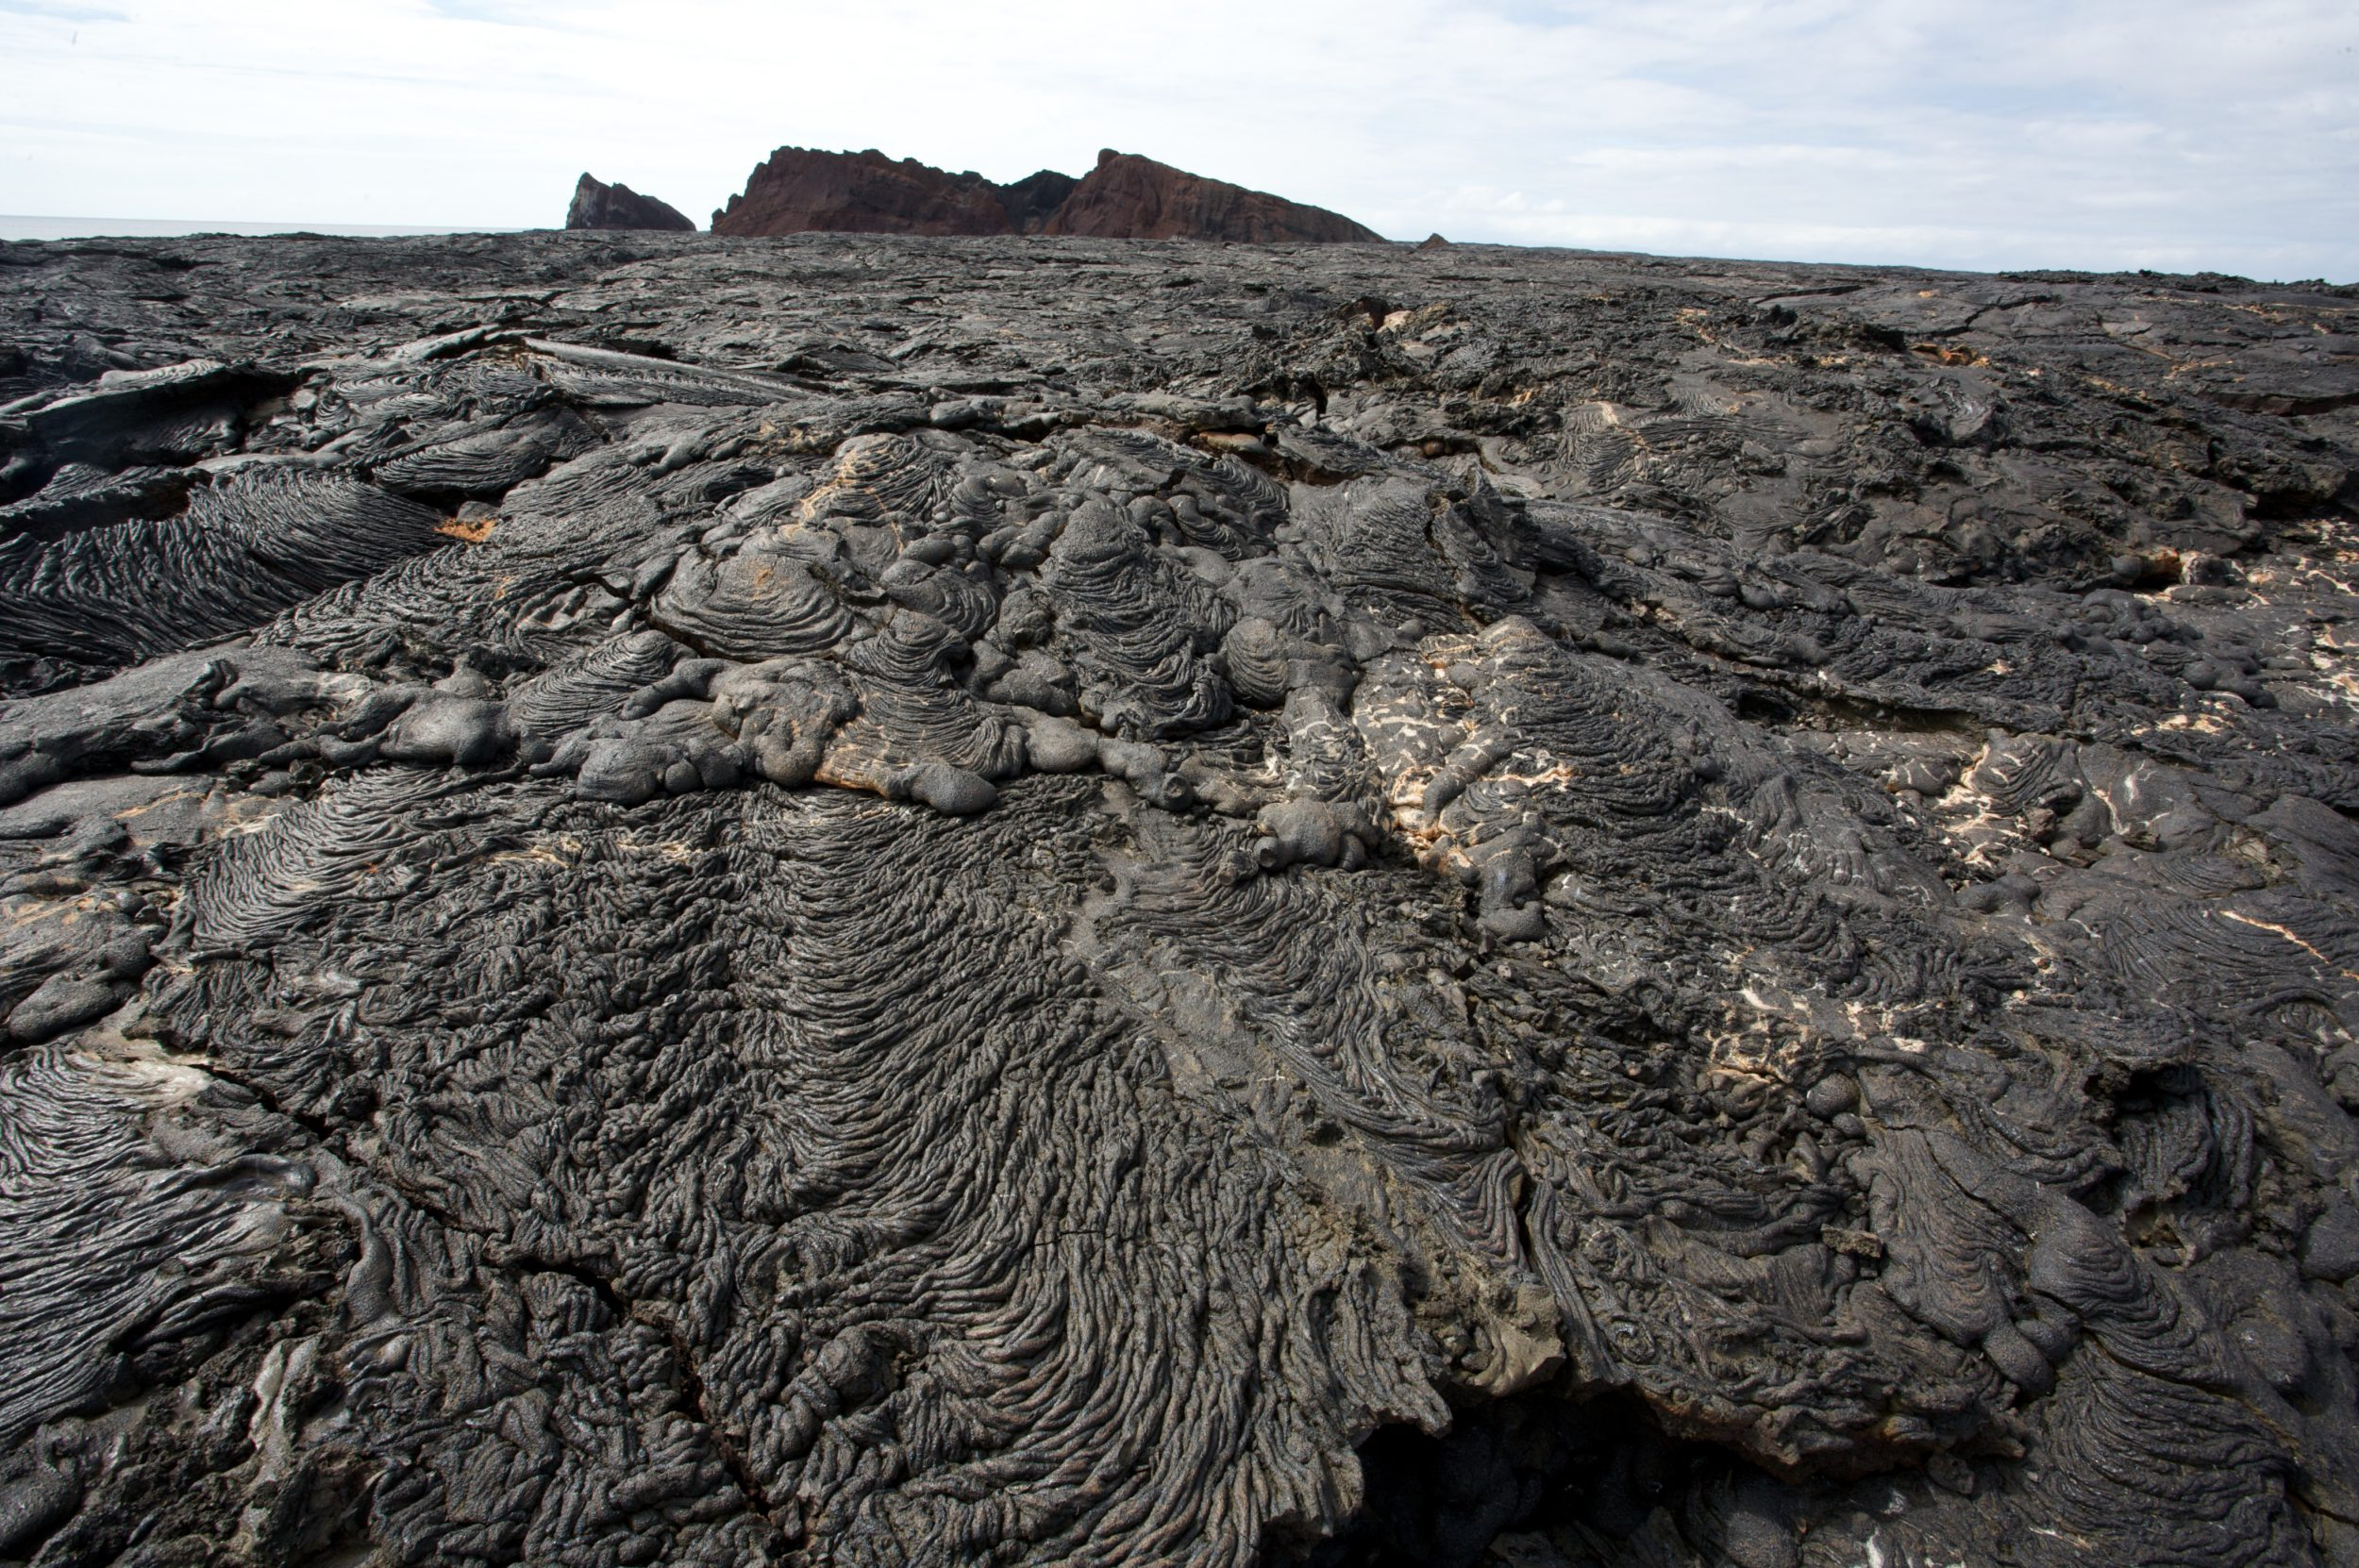 Rugged rocky terrain